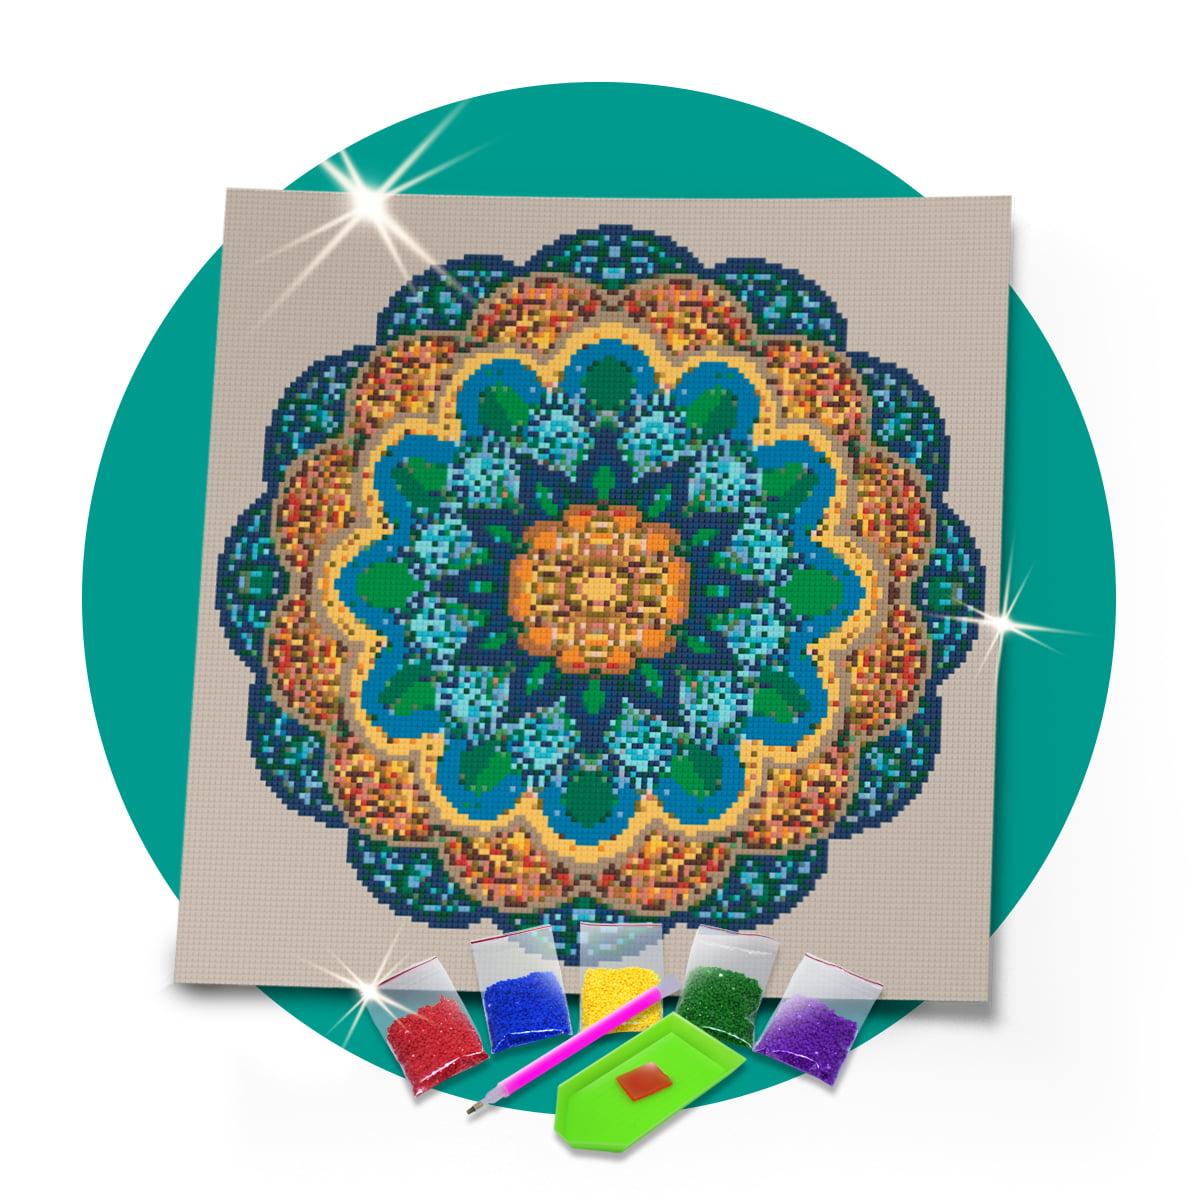 Kit Pintura com Diamantes   Tela Mandala Soberana - 40 x 40 cm - Diamante Redondo   Diamond Painting 5D DIY